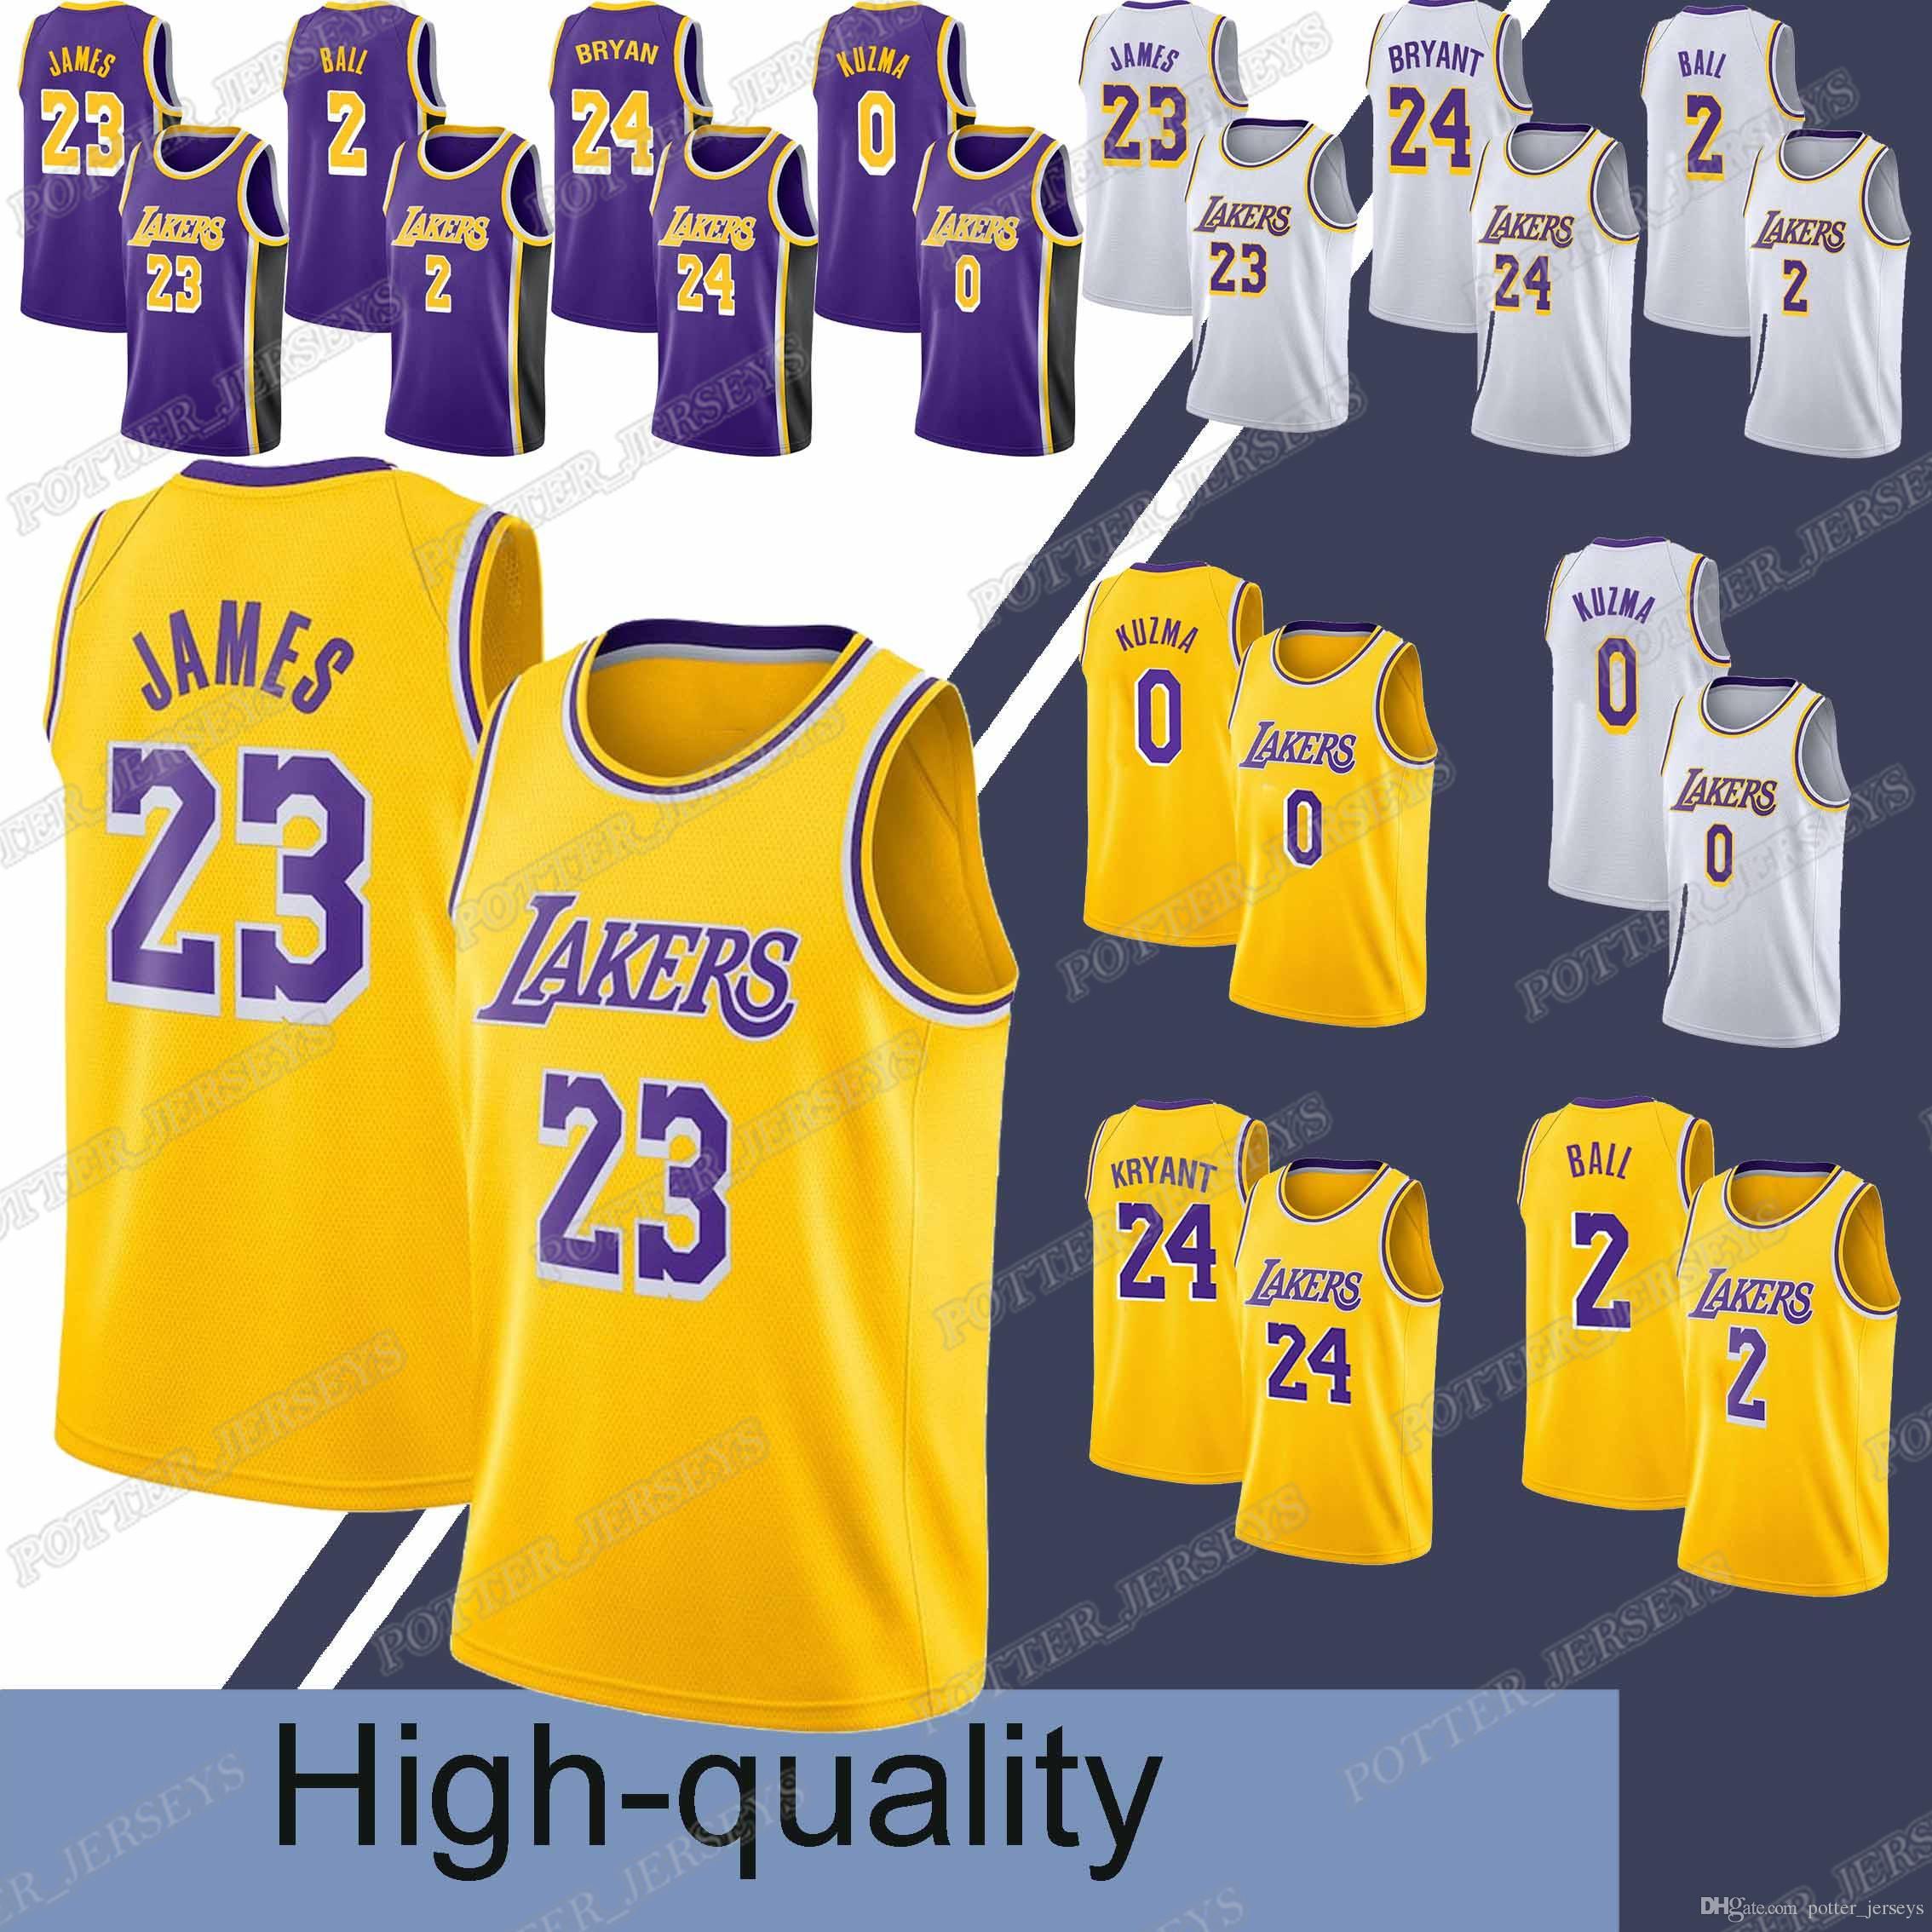 best service e67e0 4116d 23 LeBron James jersey Laker jerseys 24 Bryant 0 Kuzma 2 Ball Hot sale 2019  men basketball jerseys